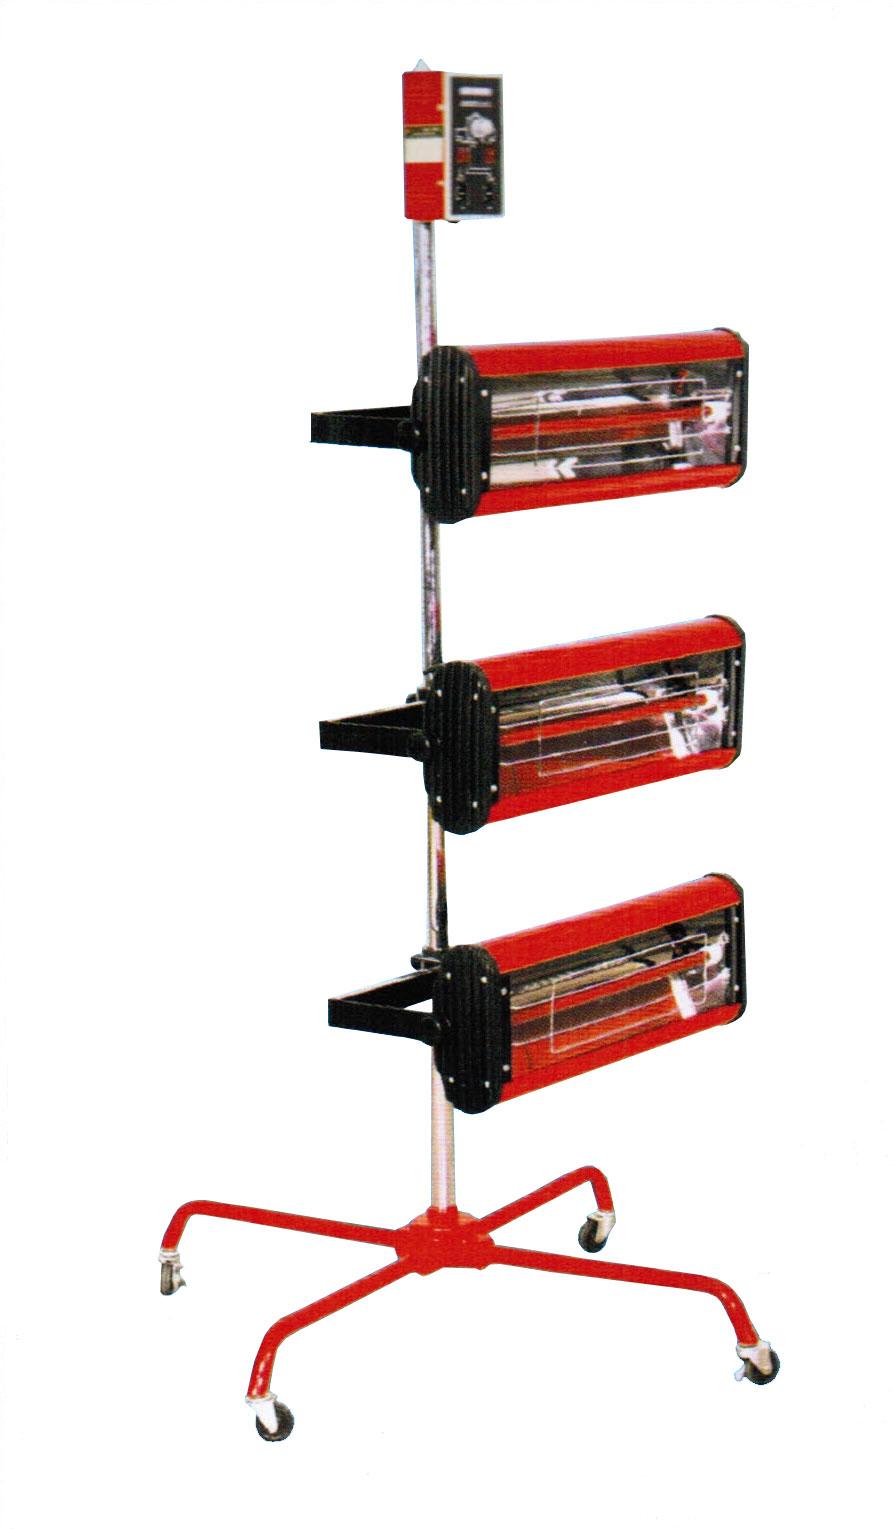 Short Wave Infrared Lamps Pro Teksprayequipment Com